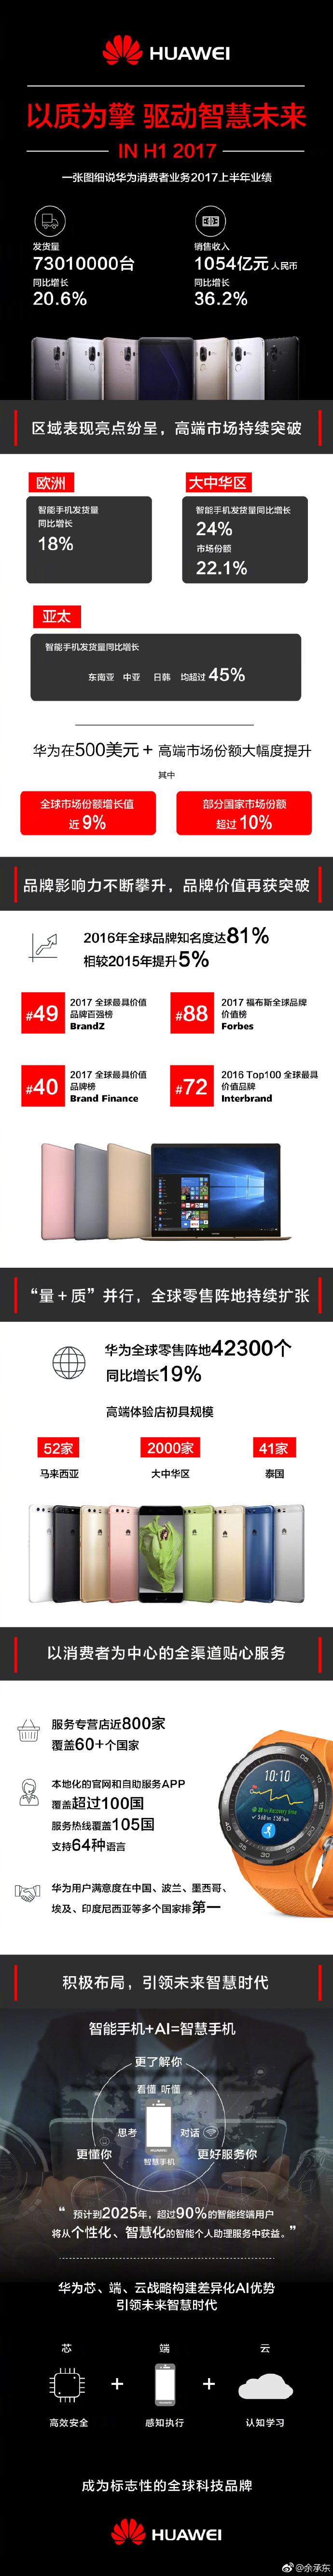 Huawei vanzari